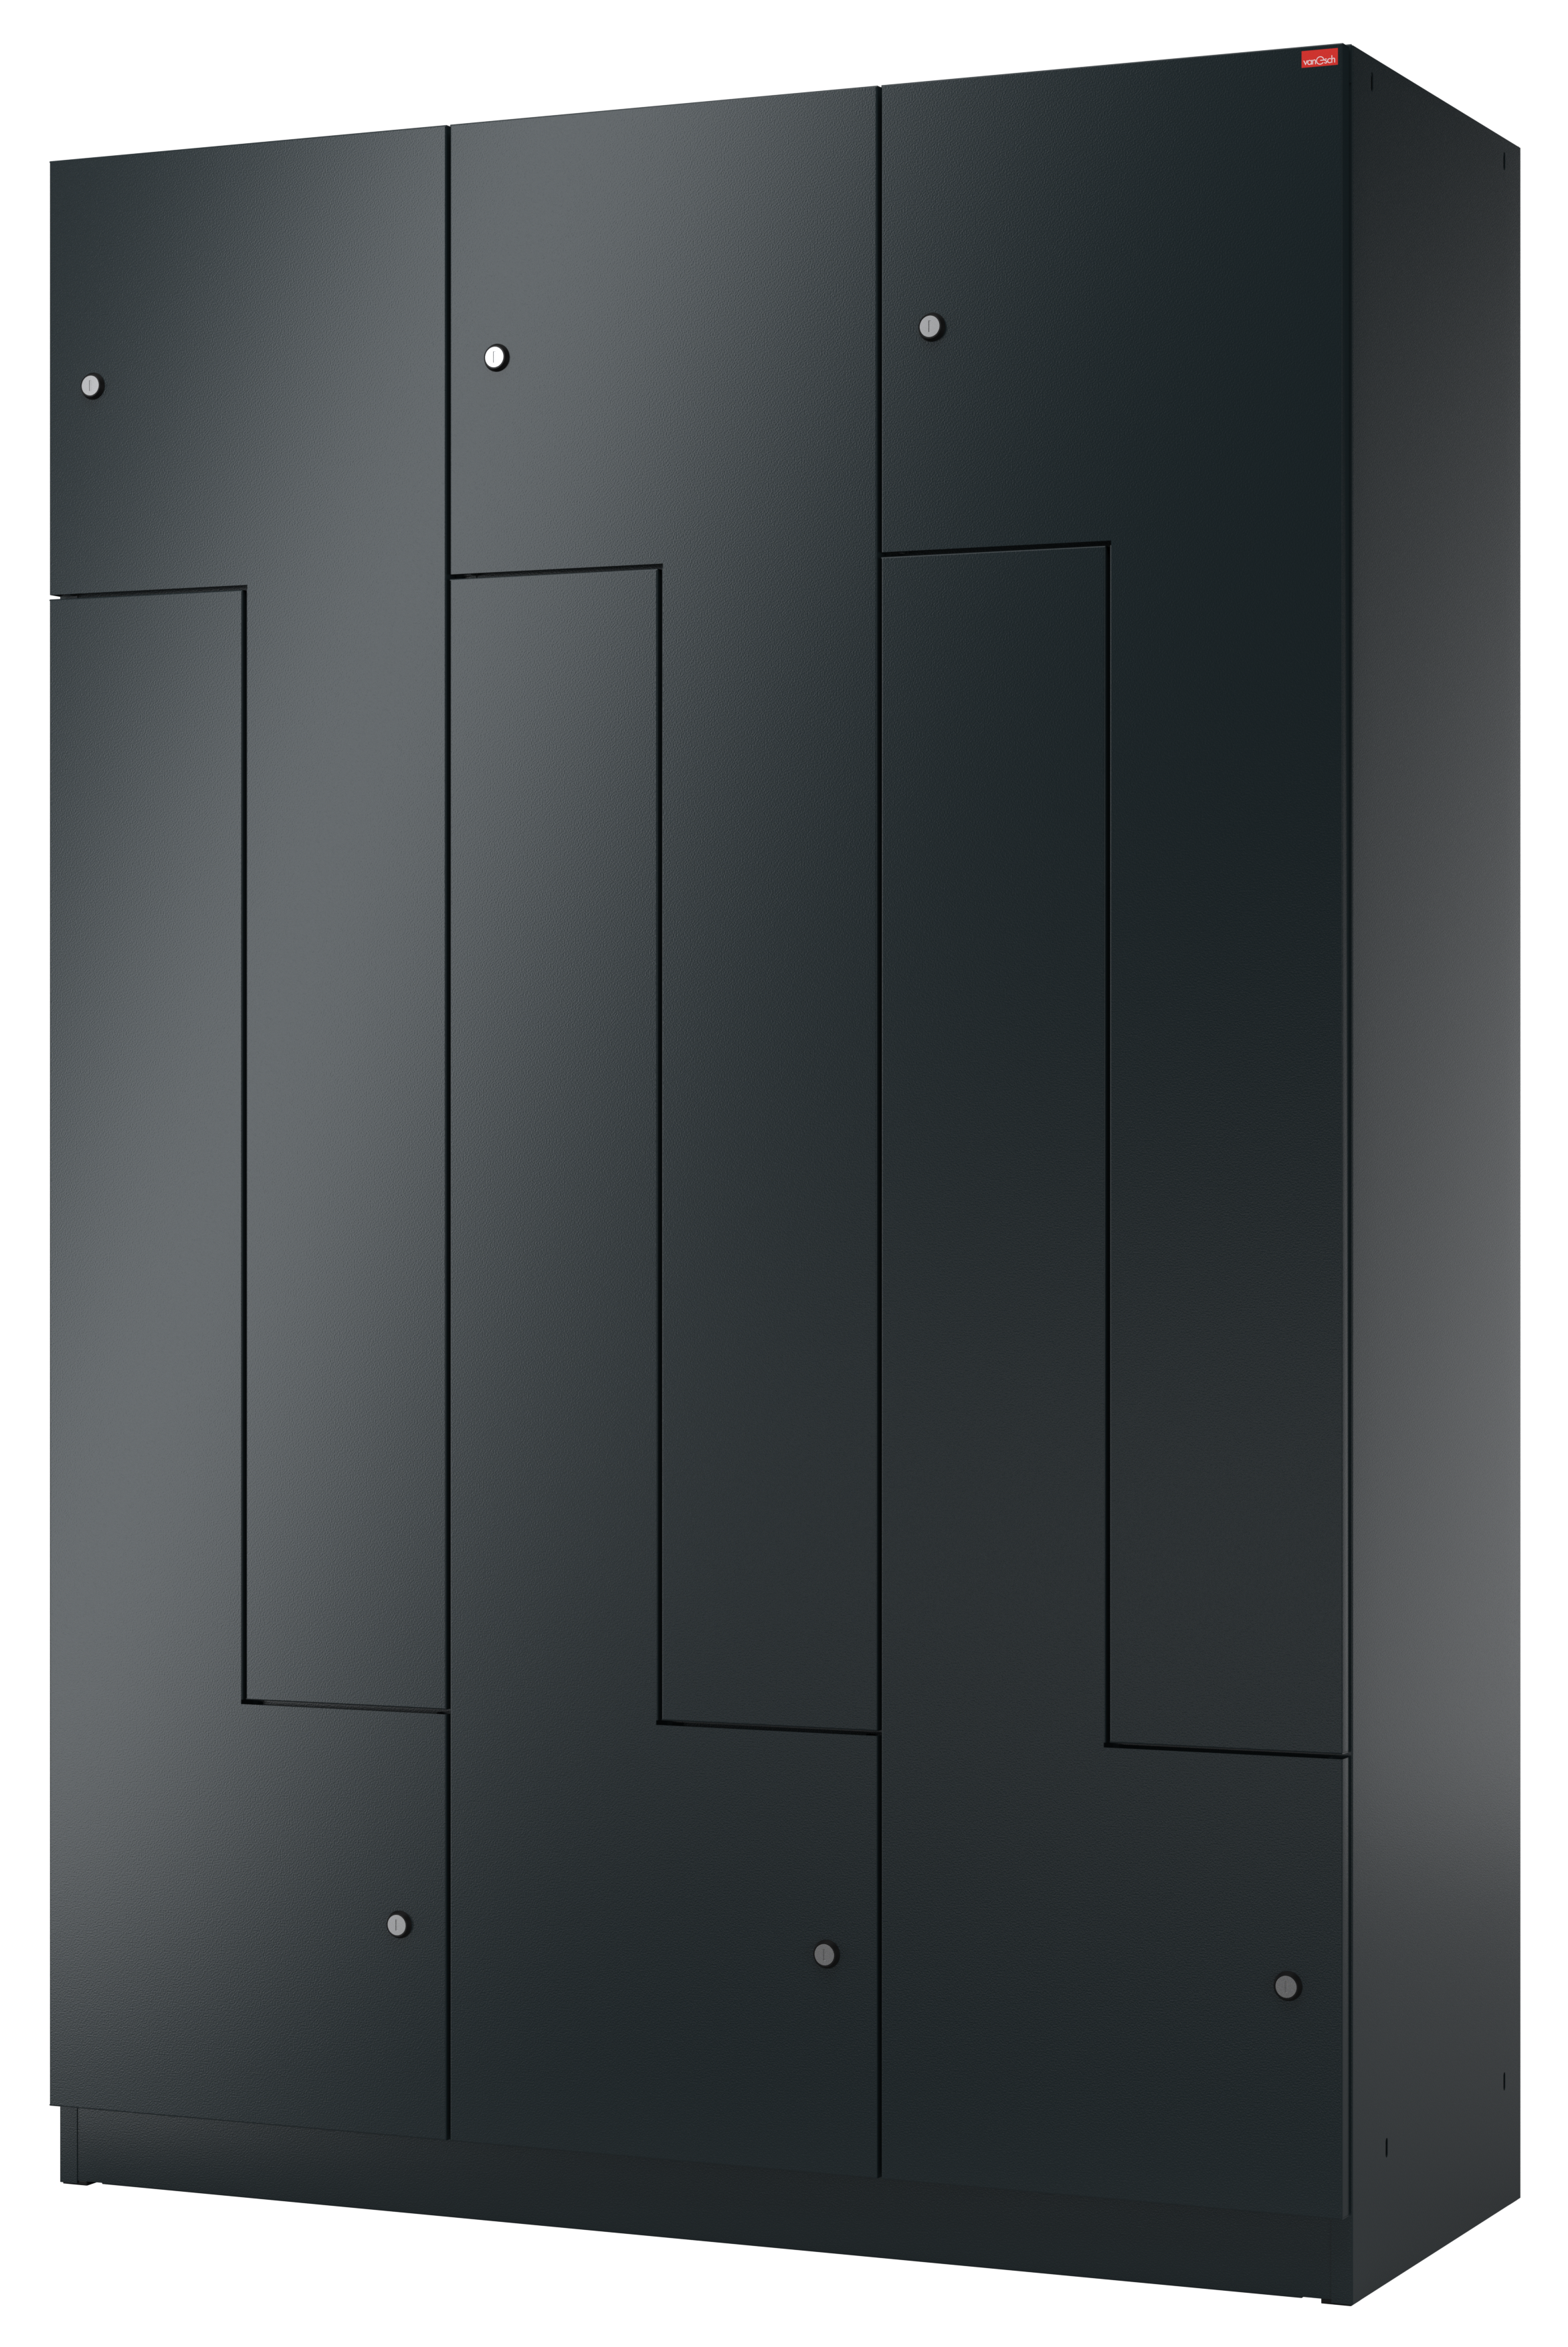 Umkleidekabinenschrank